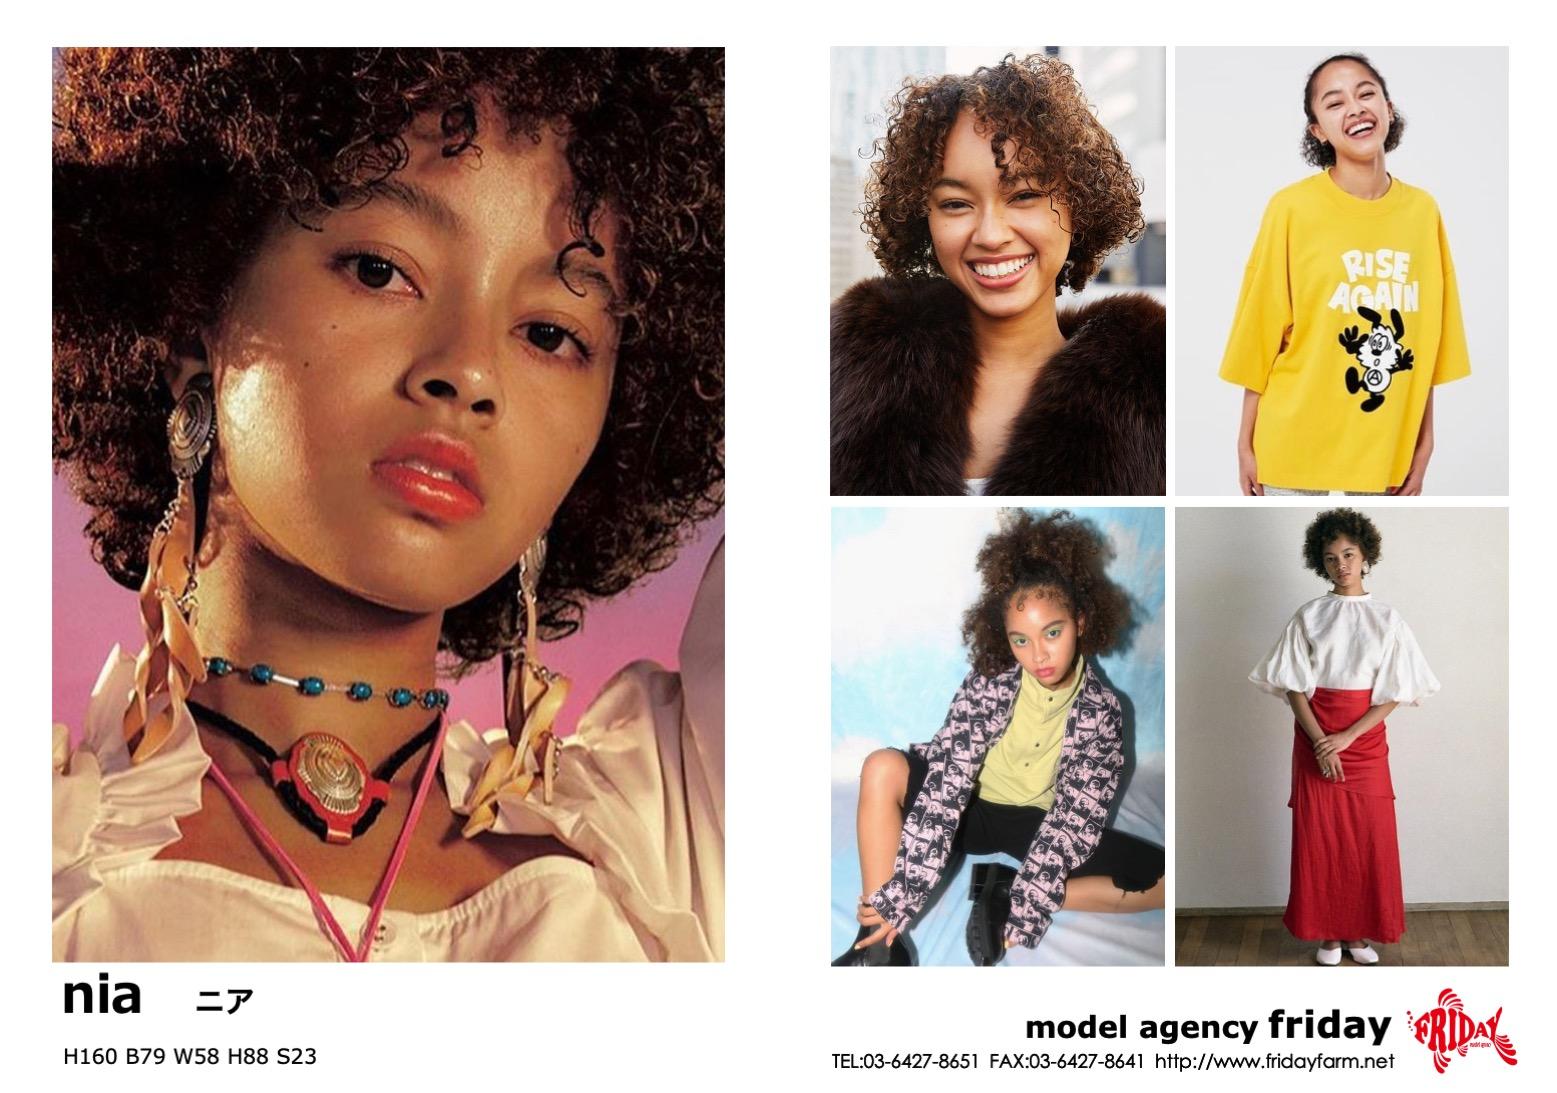 nia - ニア | model agency friday